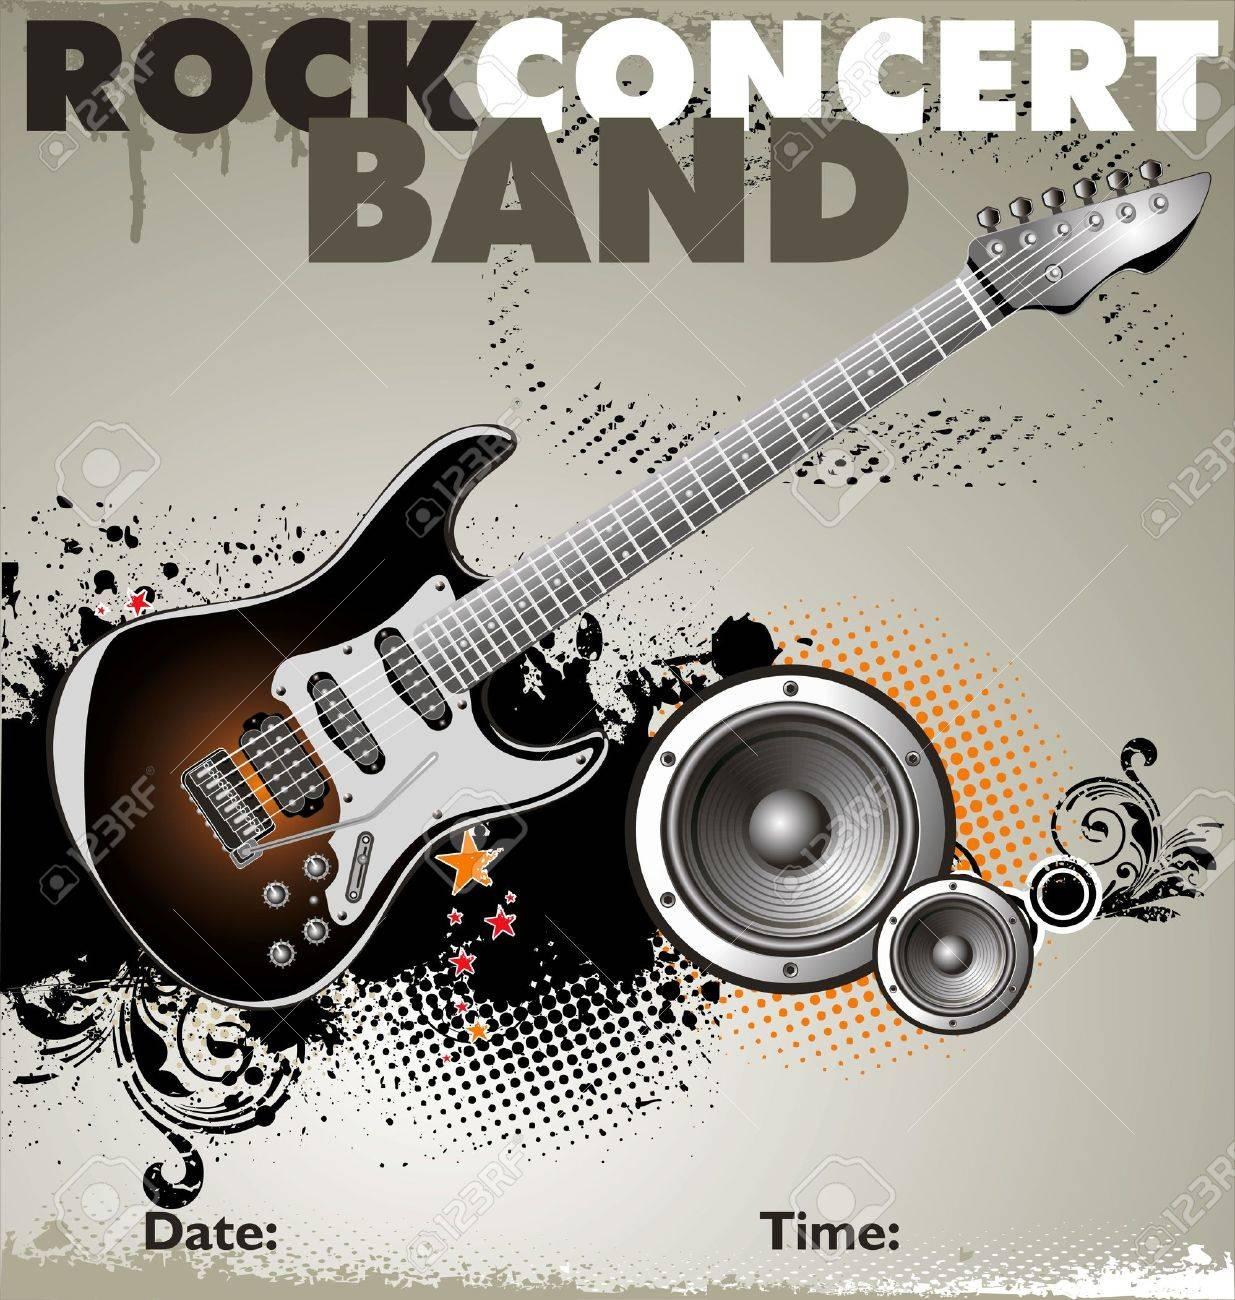 Pics photos rock concert background - Rock Concert Background Stock Vector 19137562